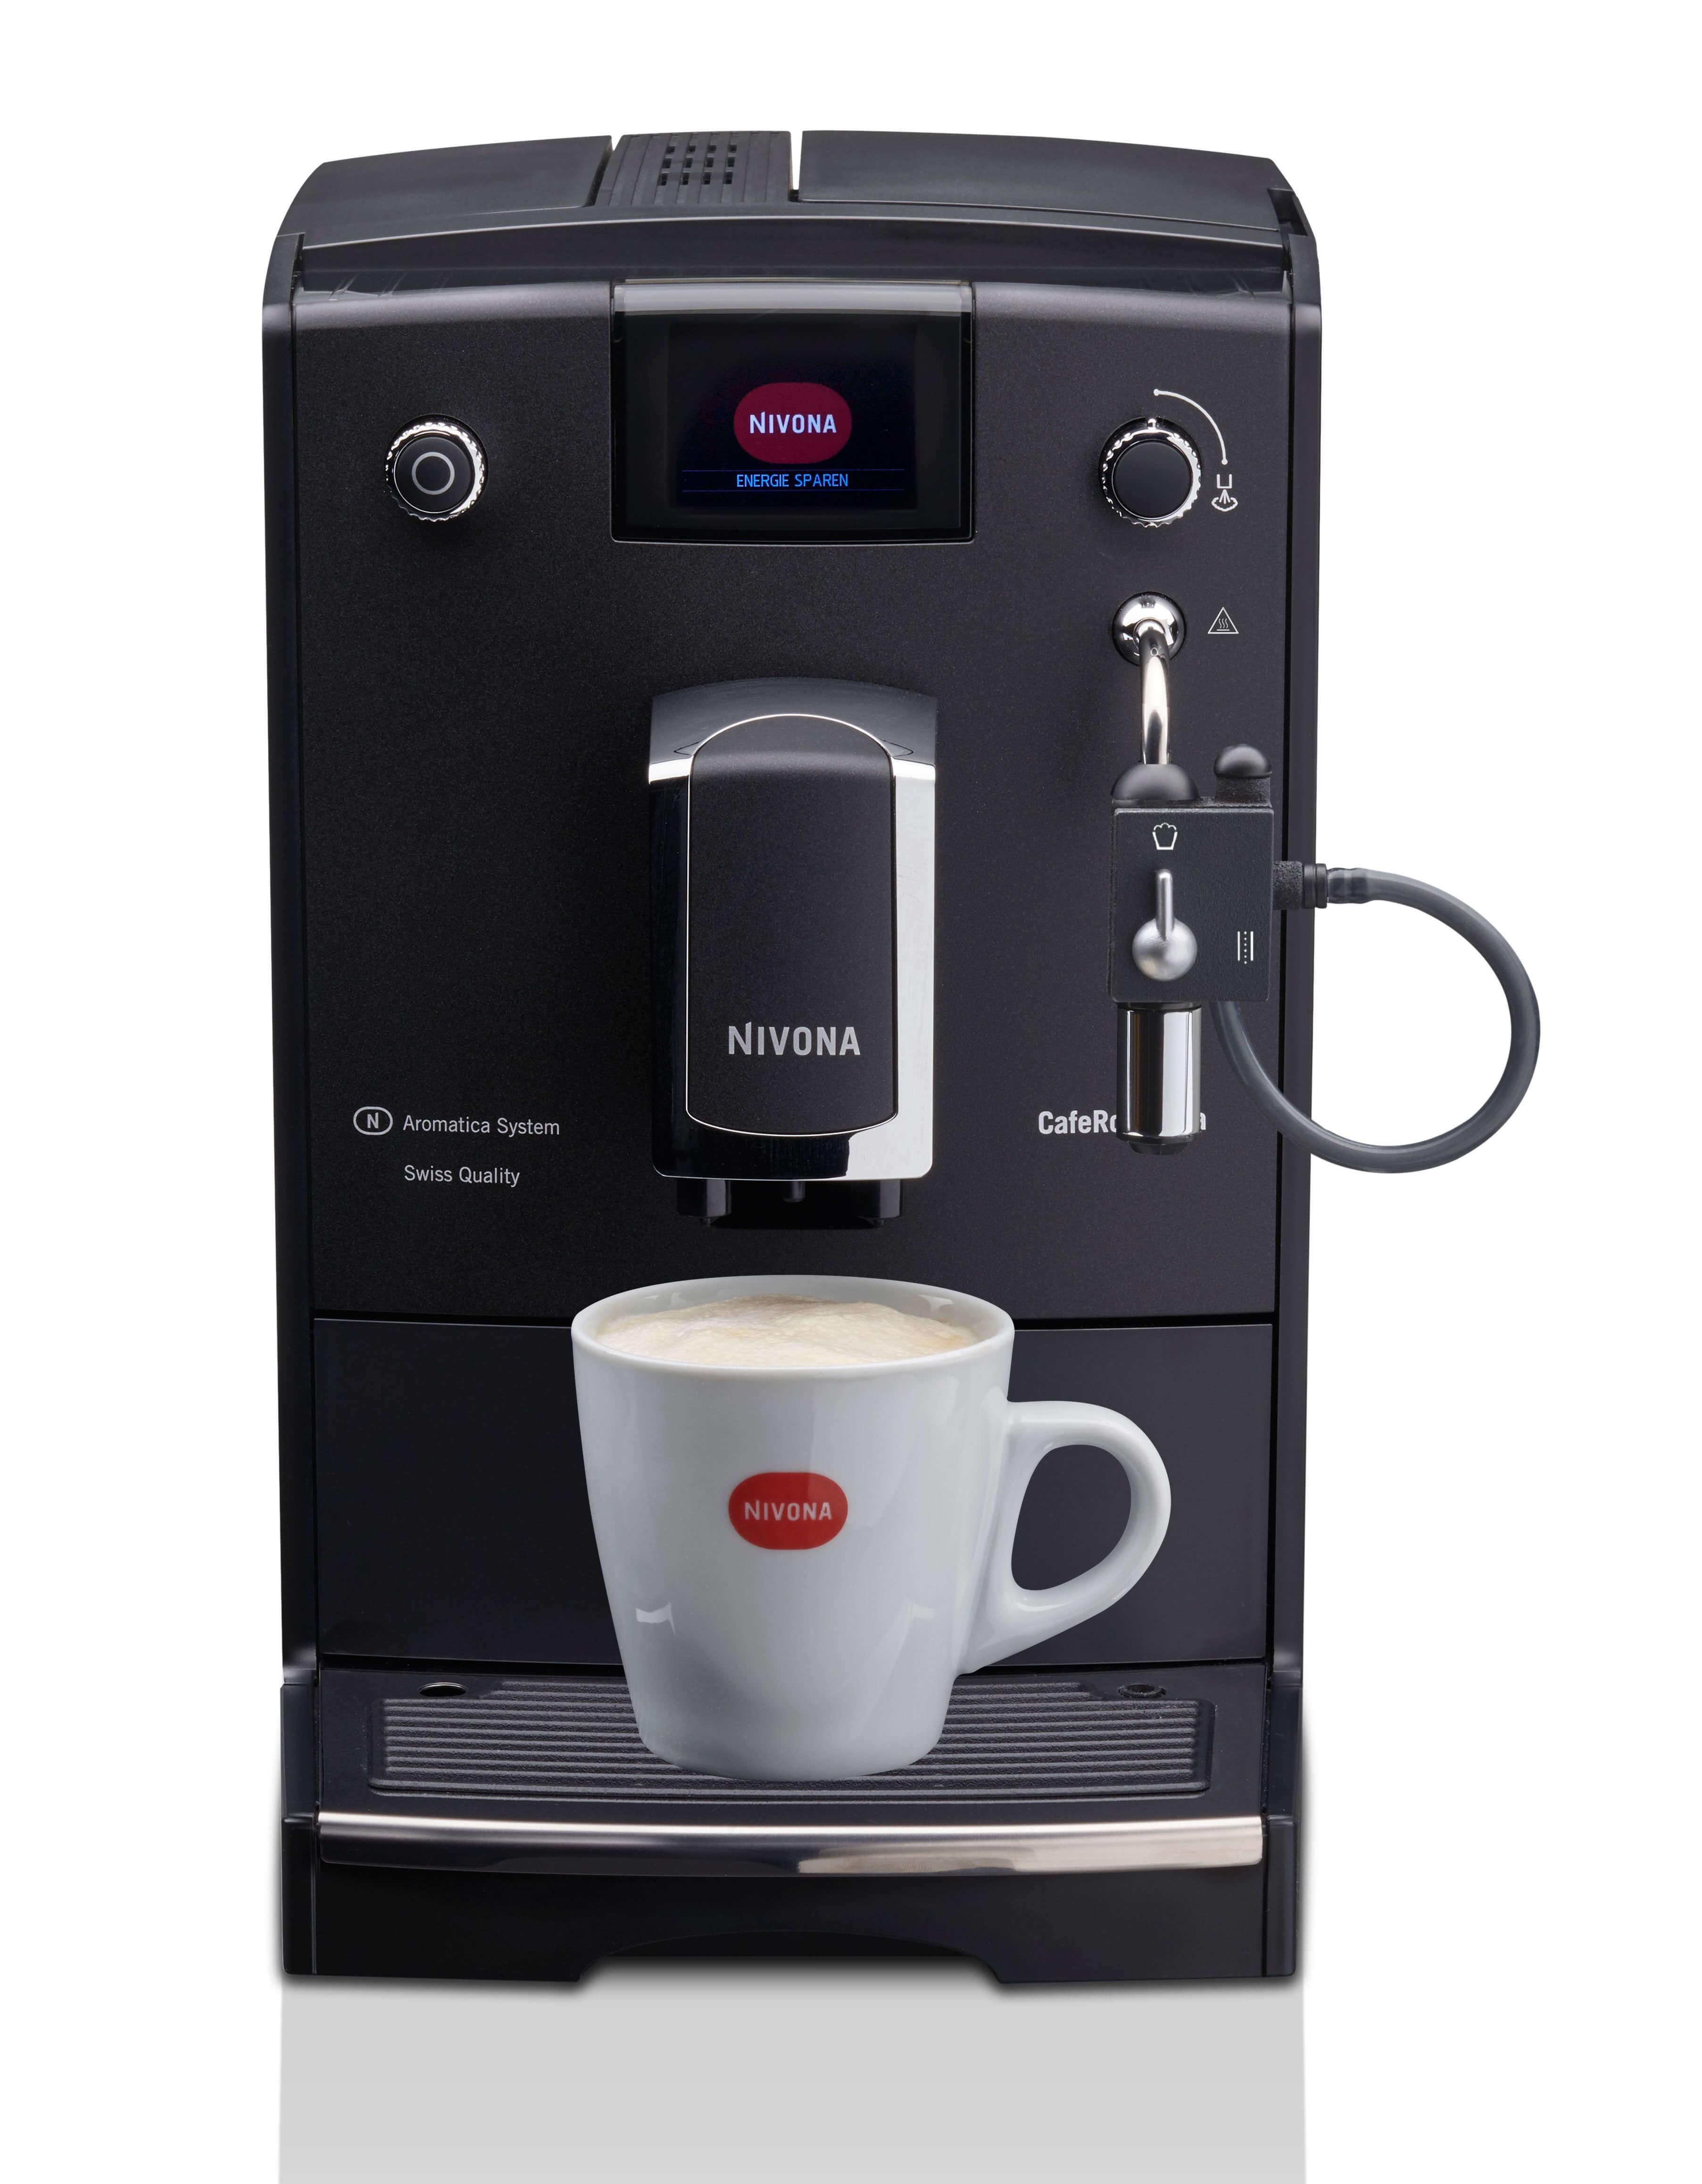 Nivona Kaffeevollautomat Cafe Romantica NICR 660 | Kamasega